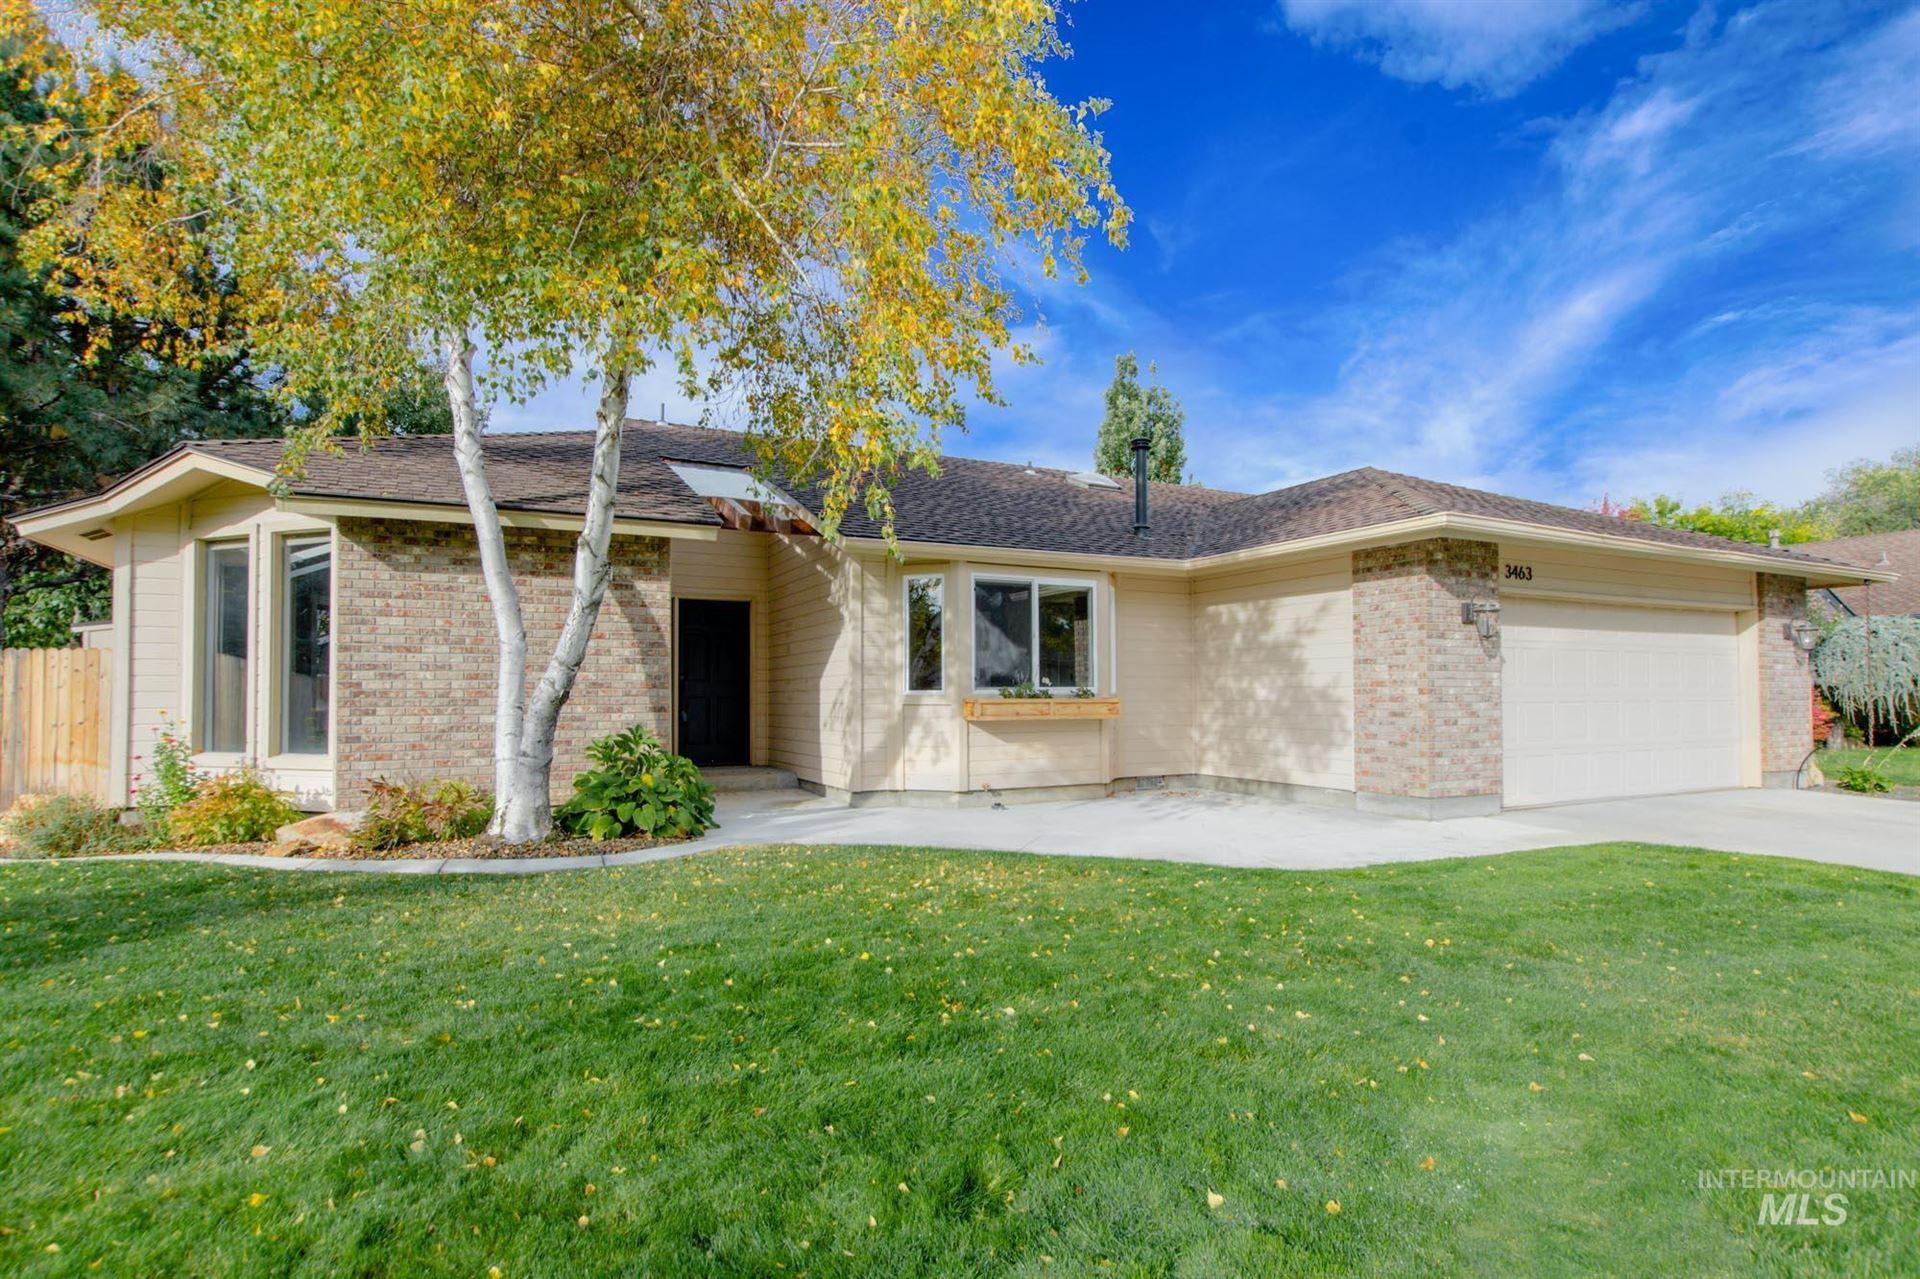 3463 S Coleridge Pl, Boise, ID 83706 - MLS#: 98821487